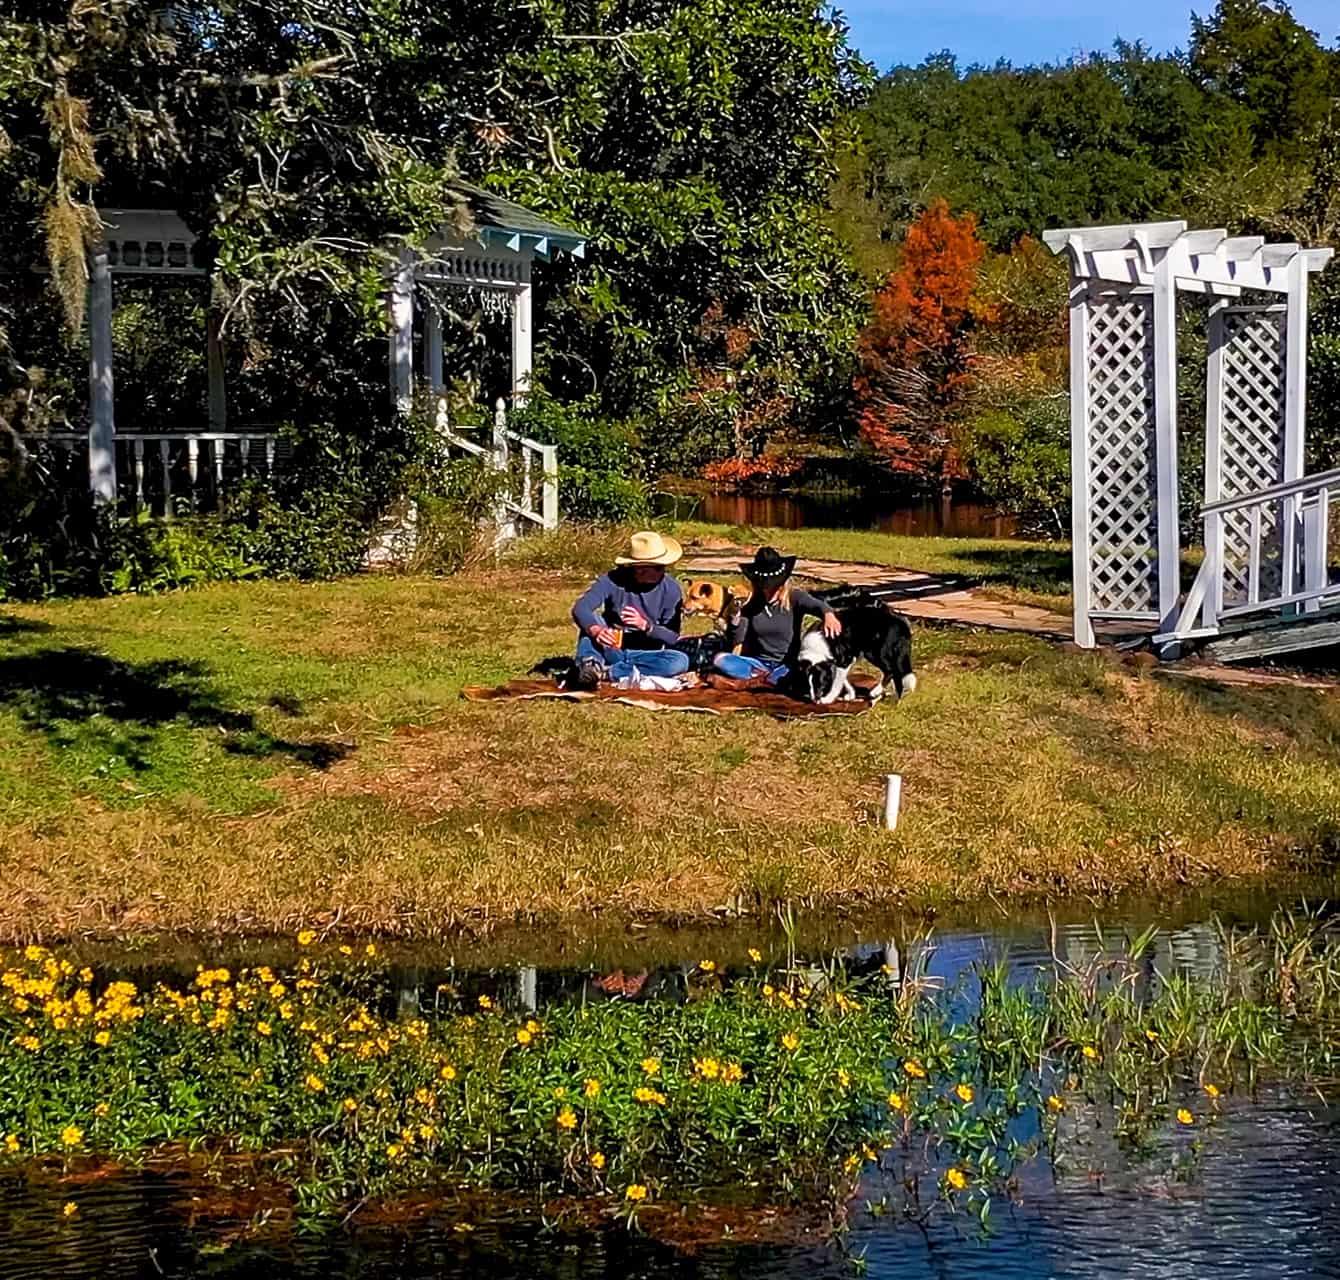 Couple having a romantic picnic at the lake